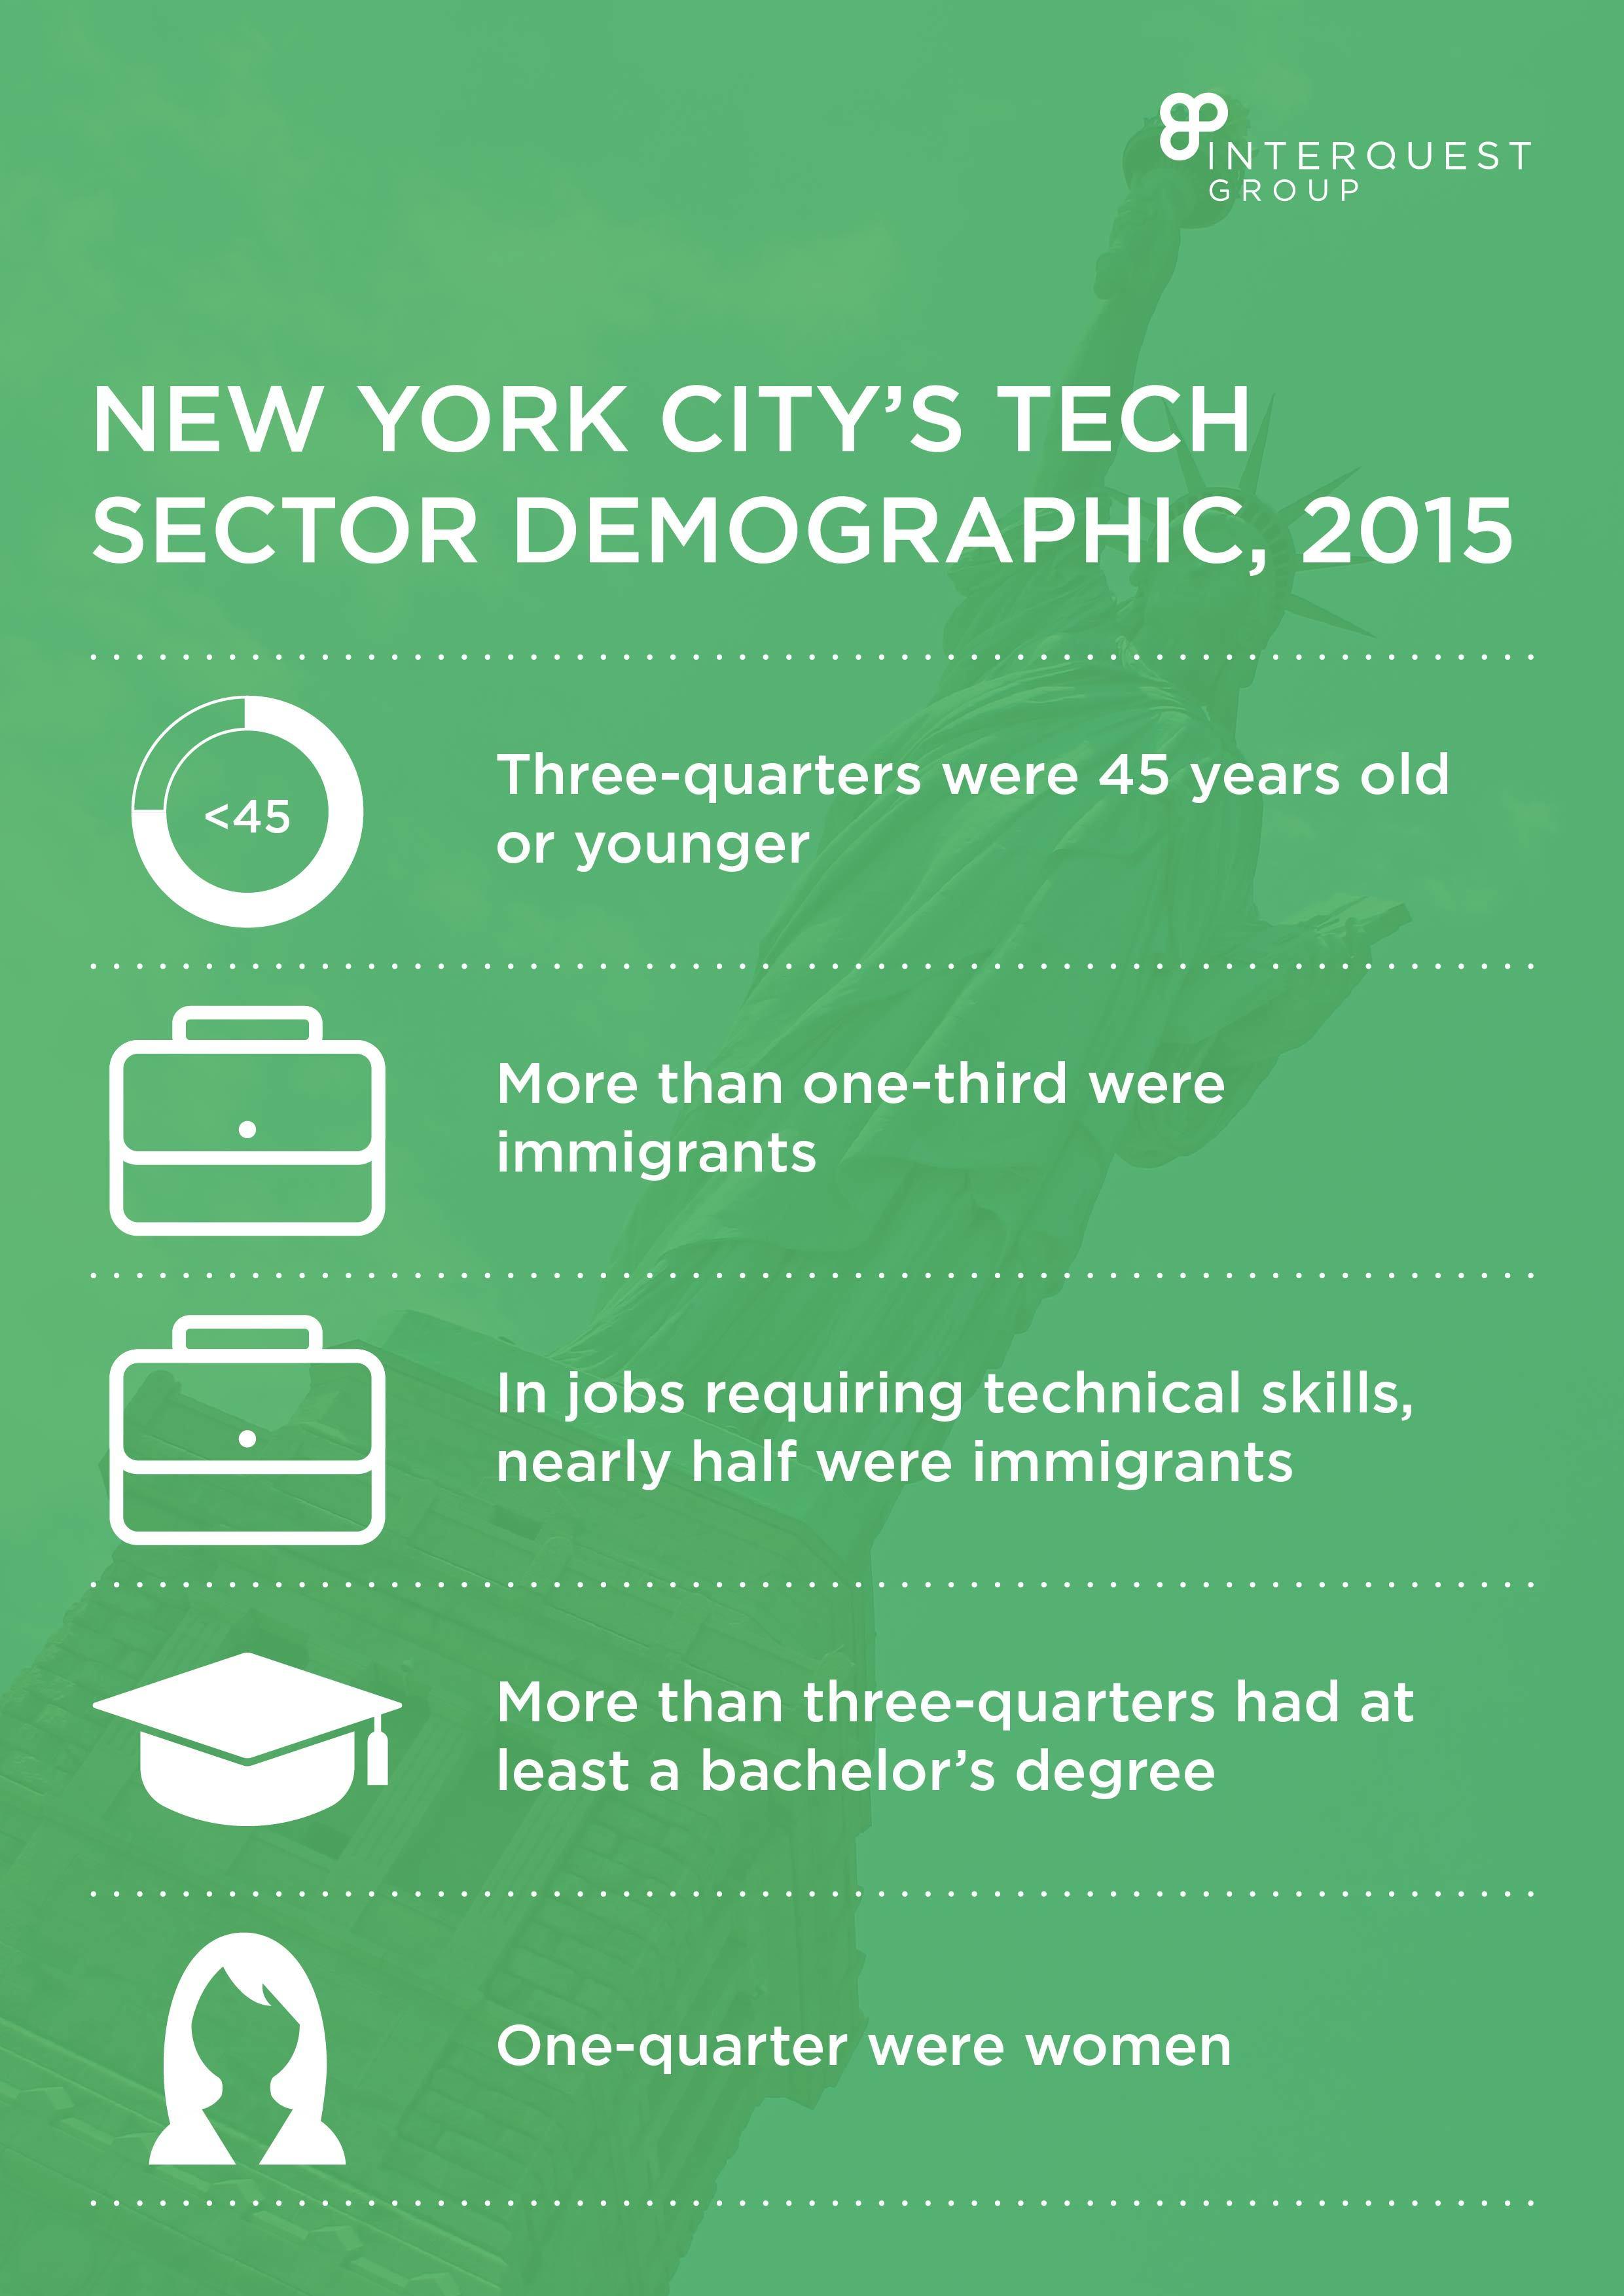 New York City's Tech Sector Demographic, 2015